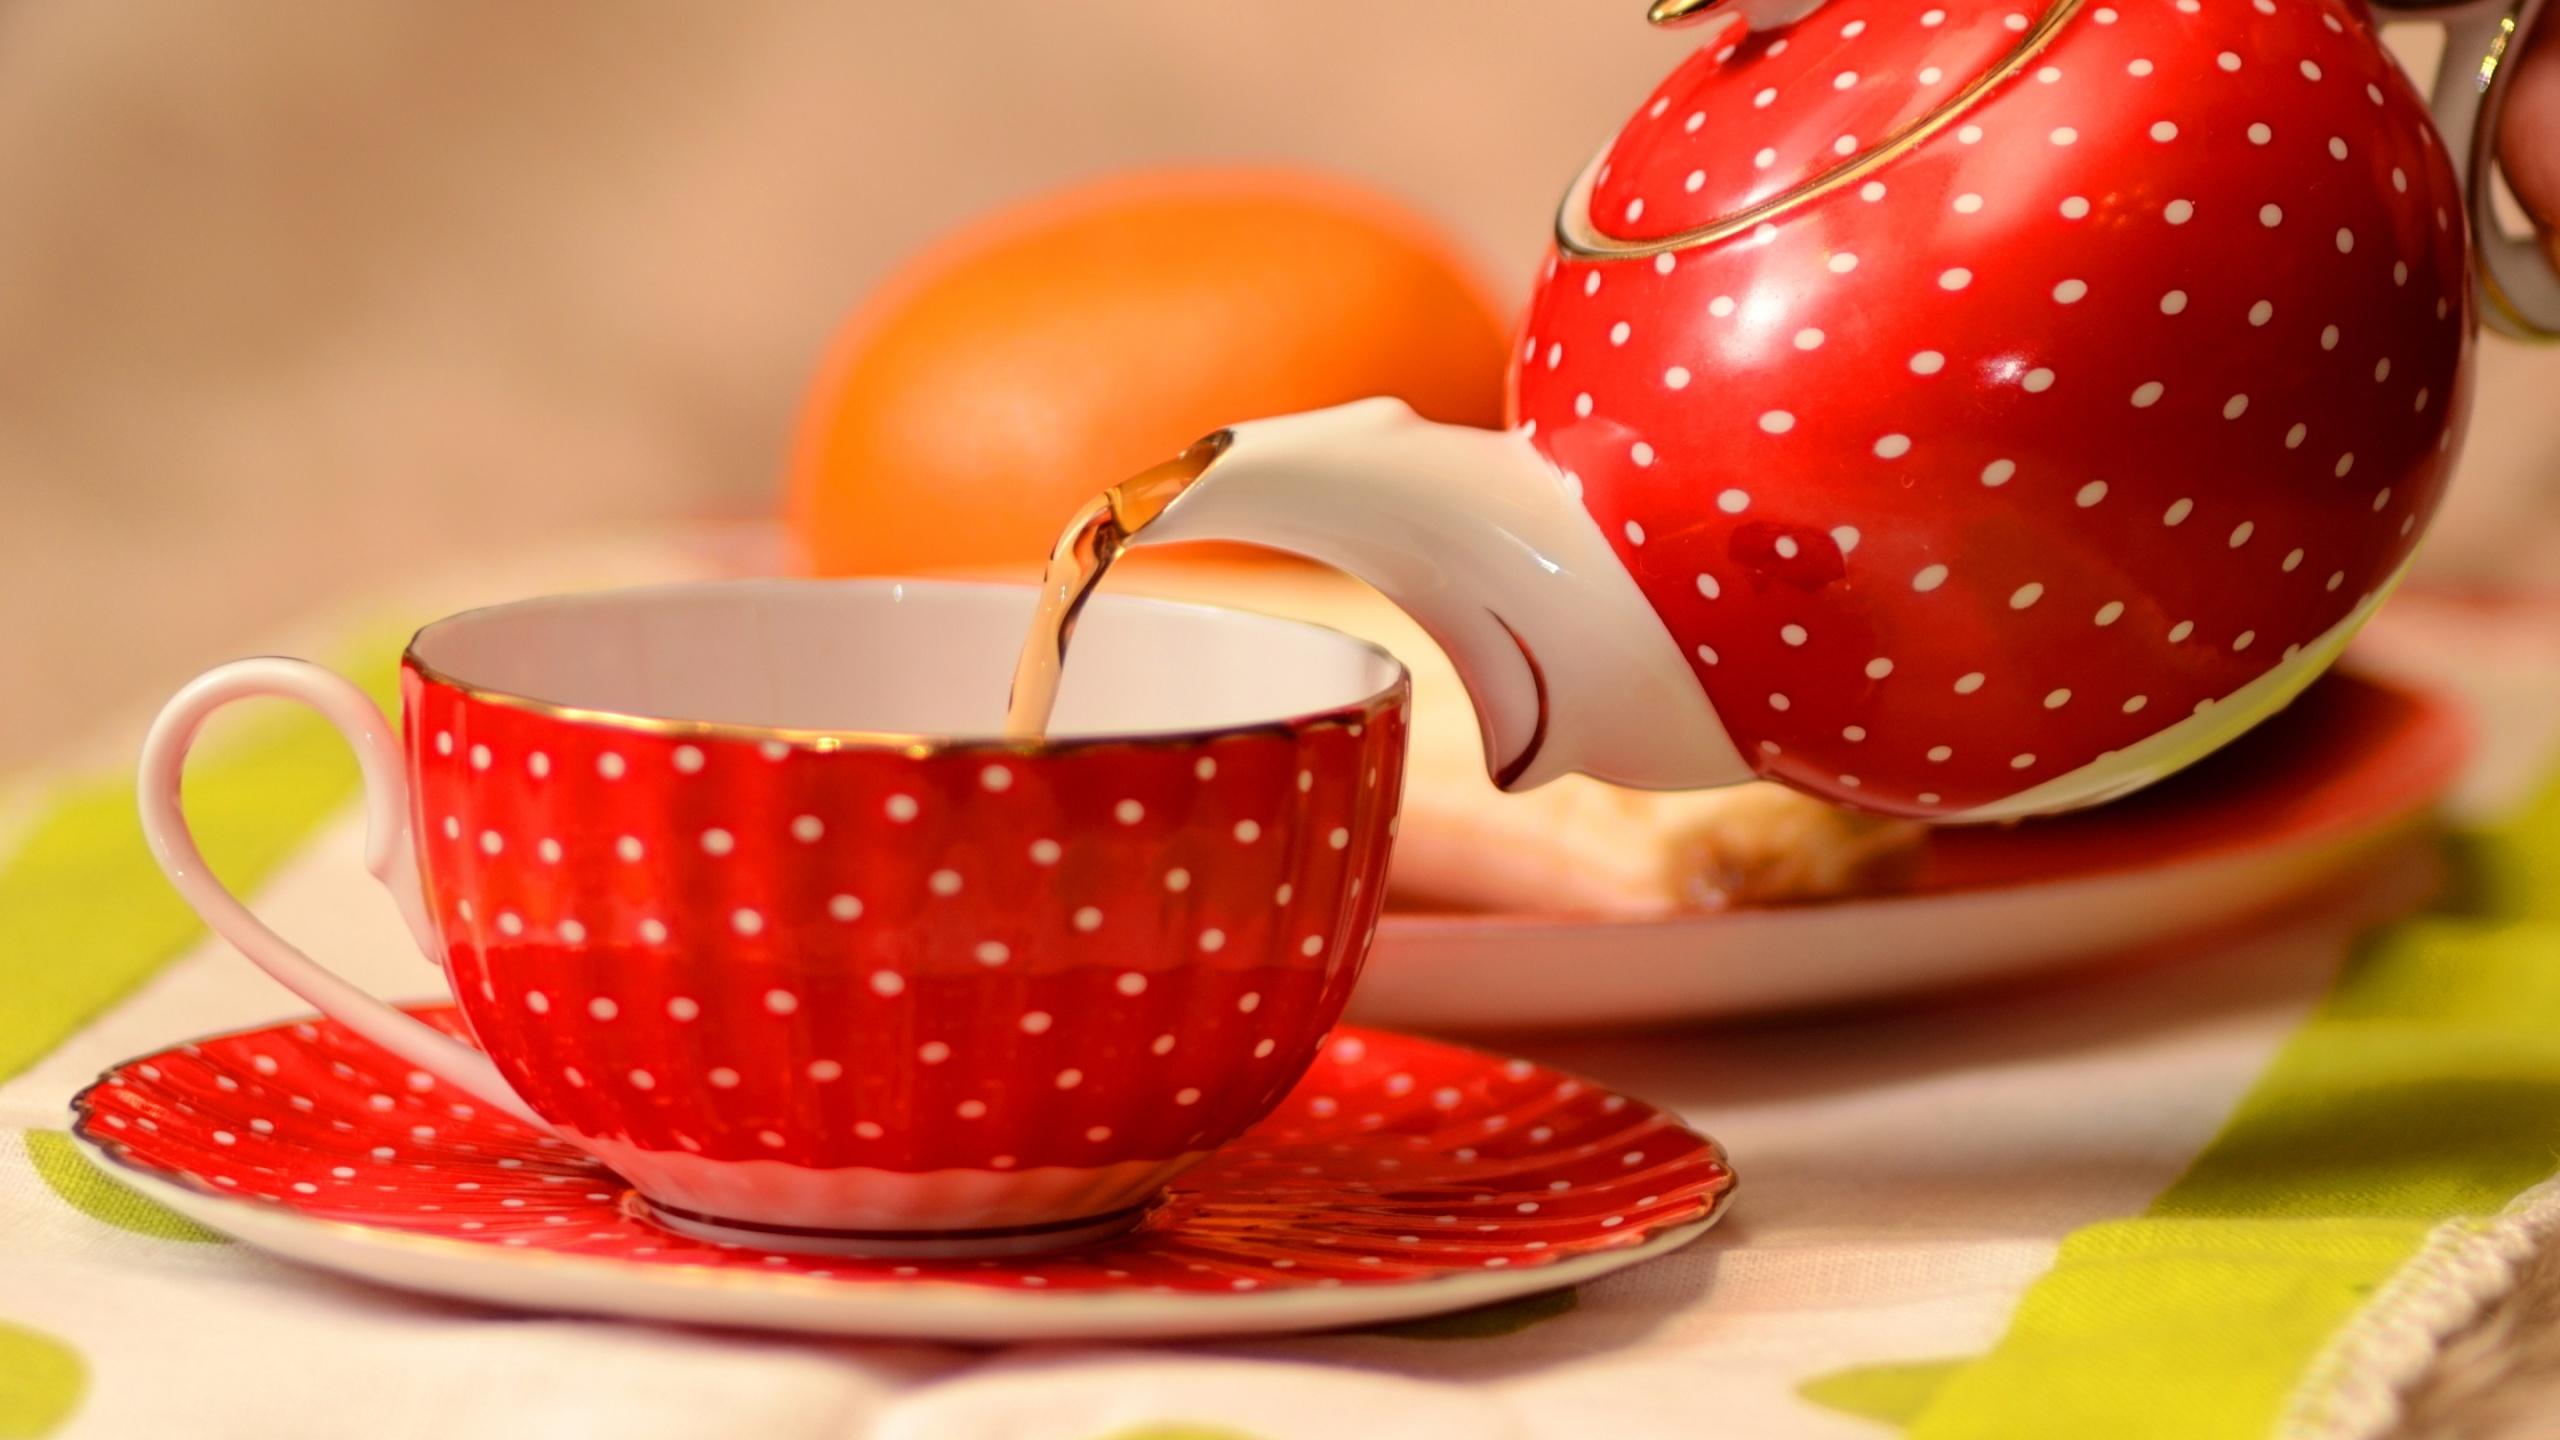 Lovely Tea Cup Wallpaper